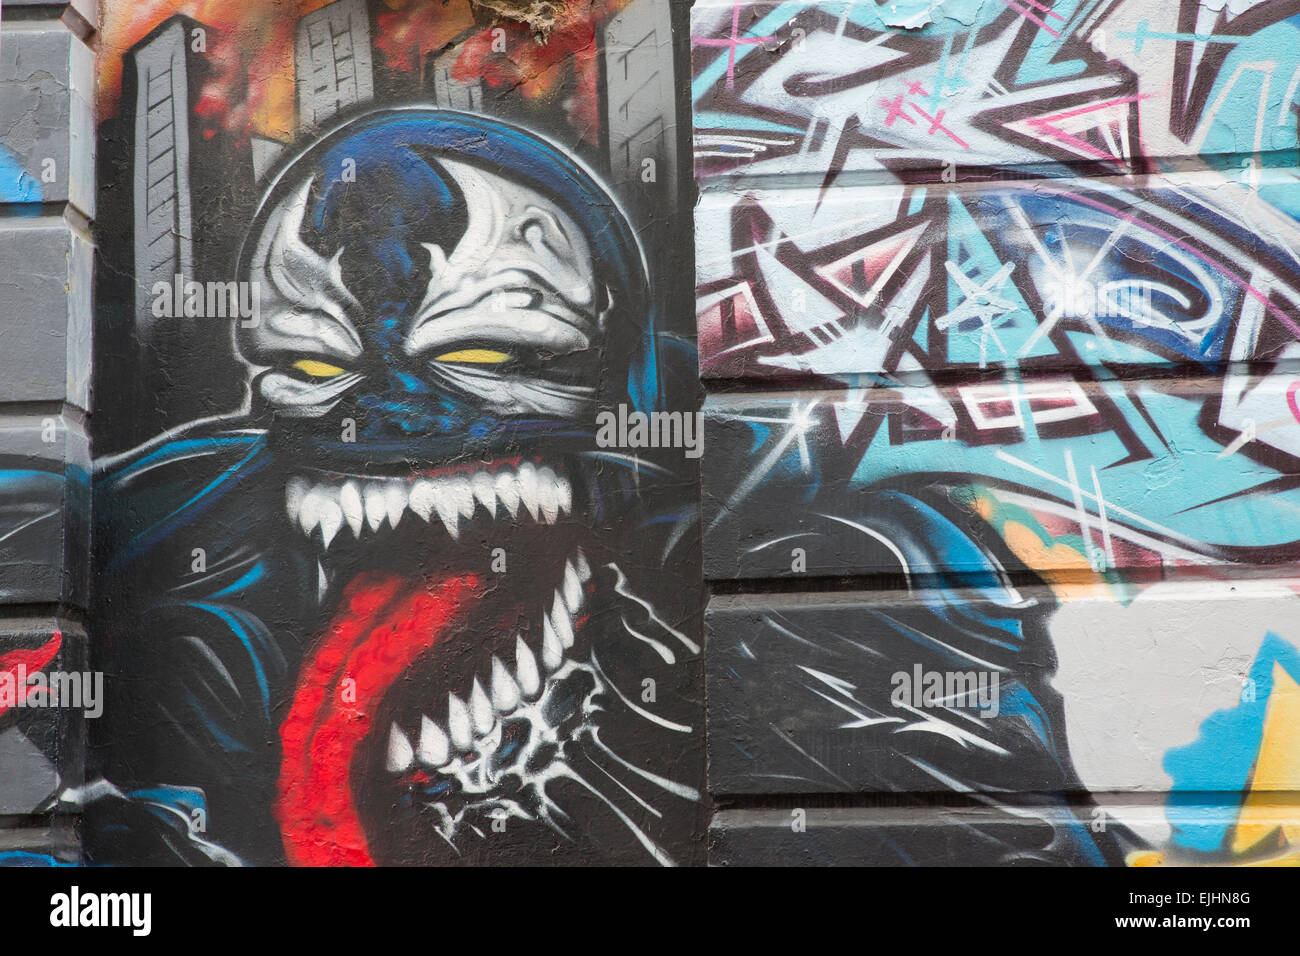 Graffiti - Kipling Street, East Richmond, Melbourne, Australia. Image taken on March 22nd 2015 - Stock Image